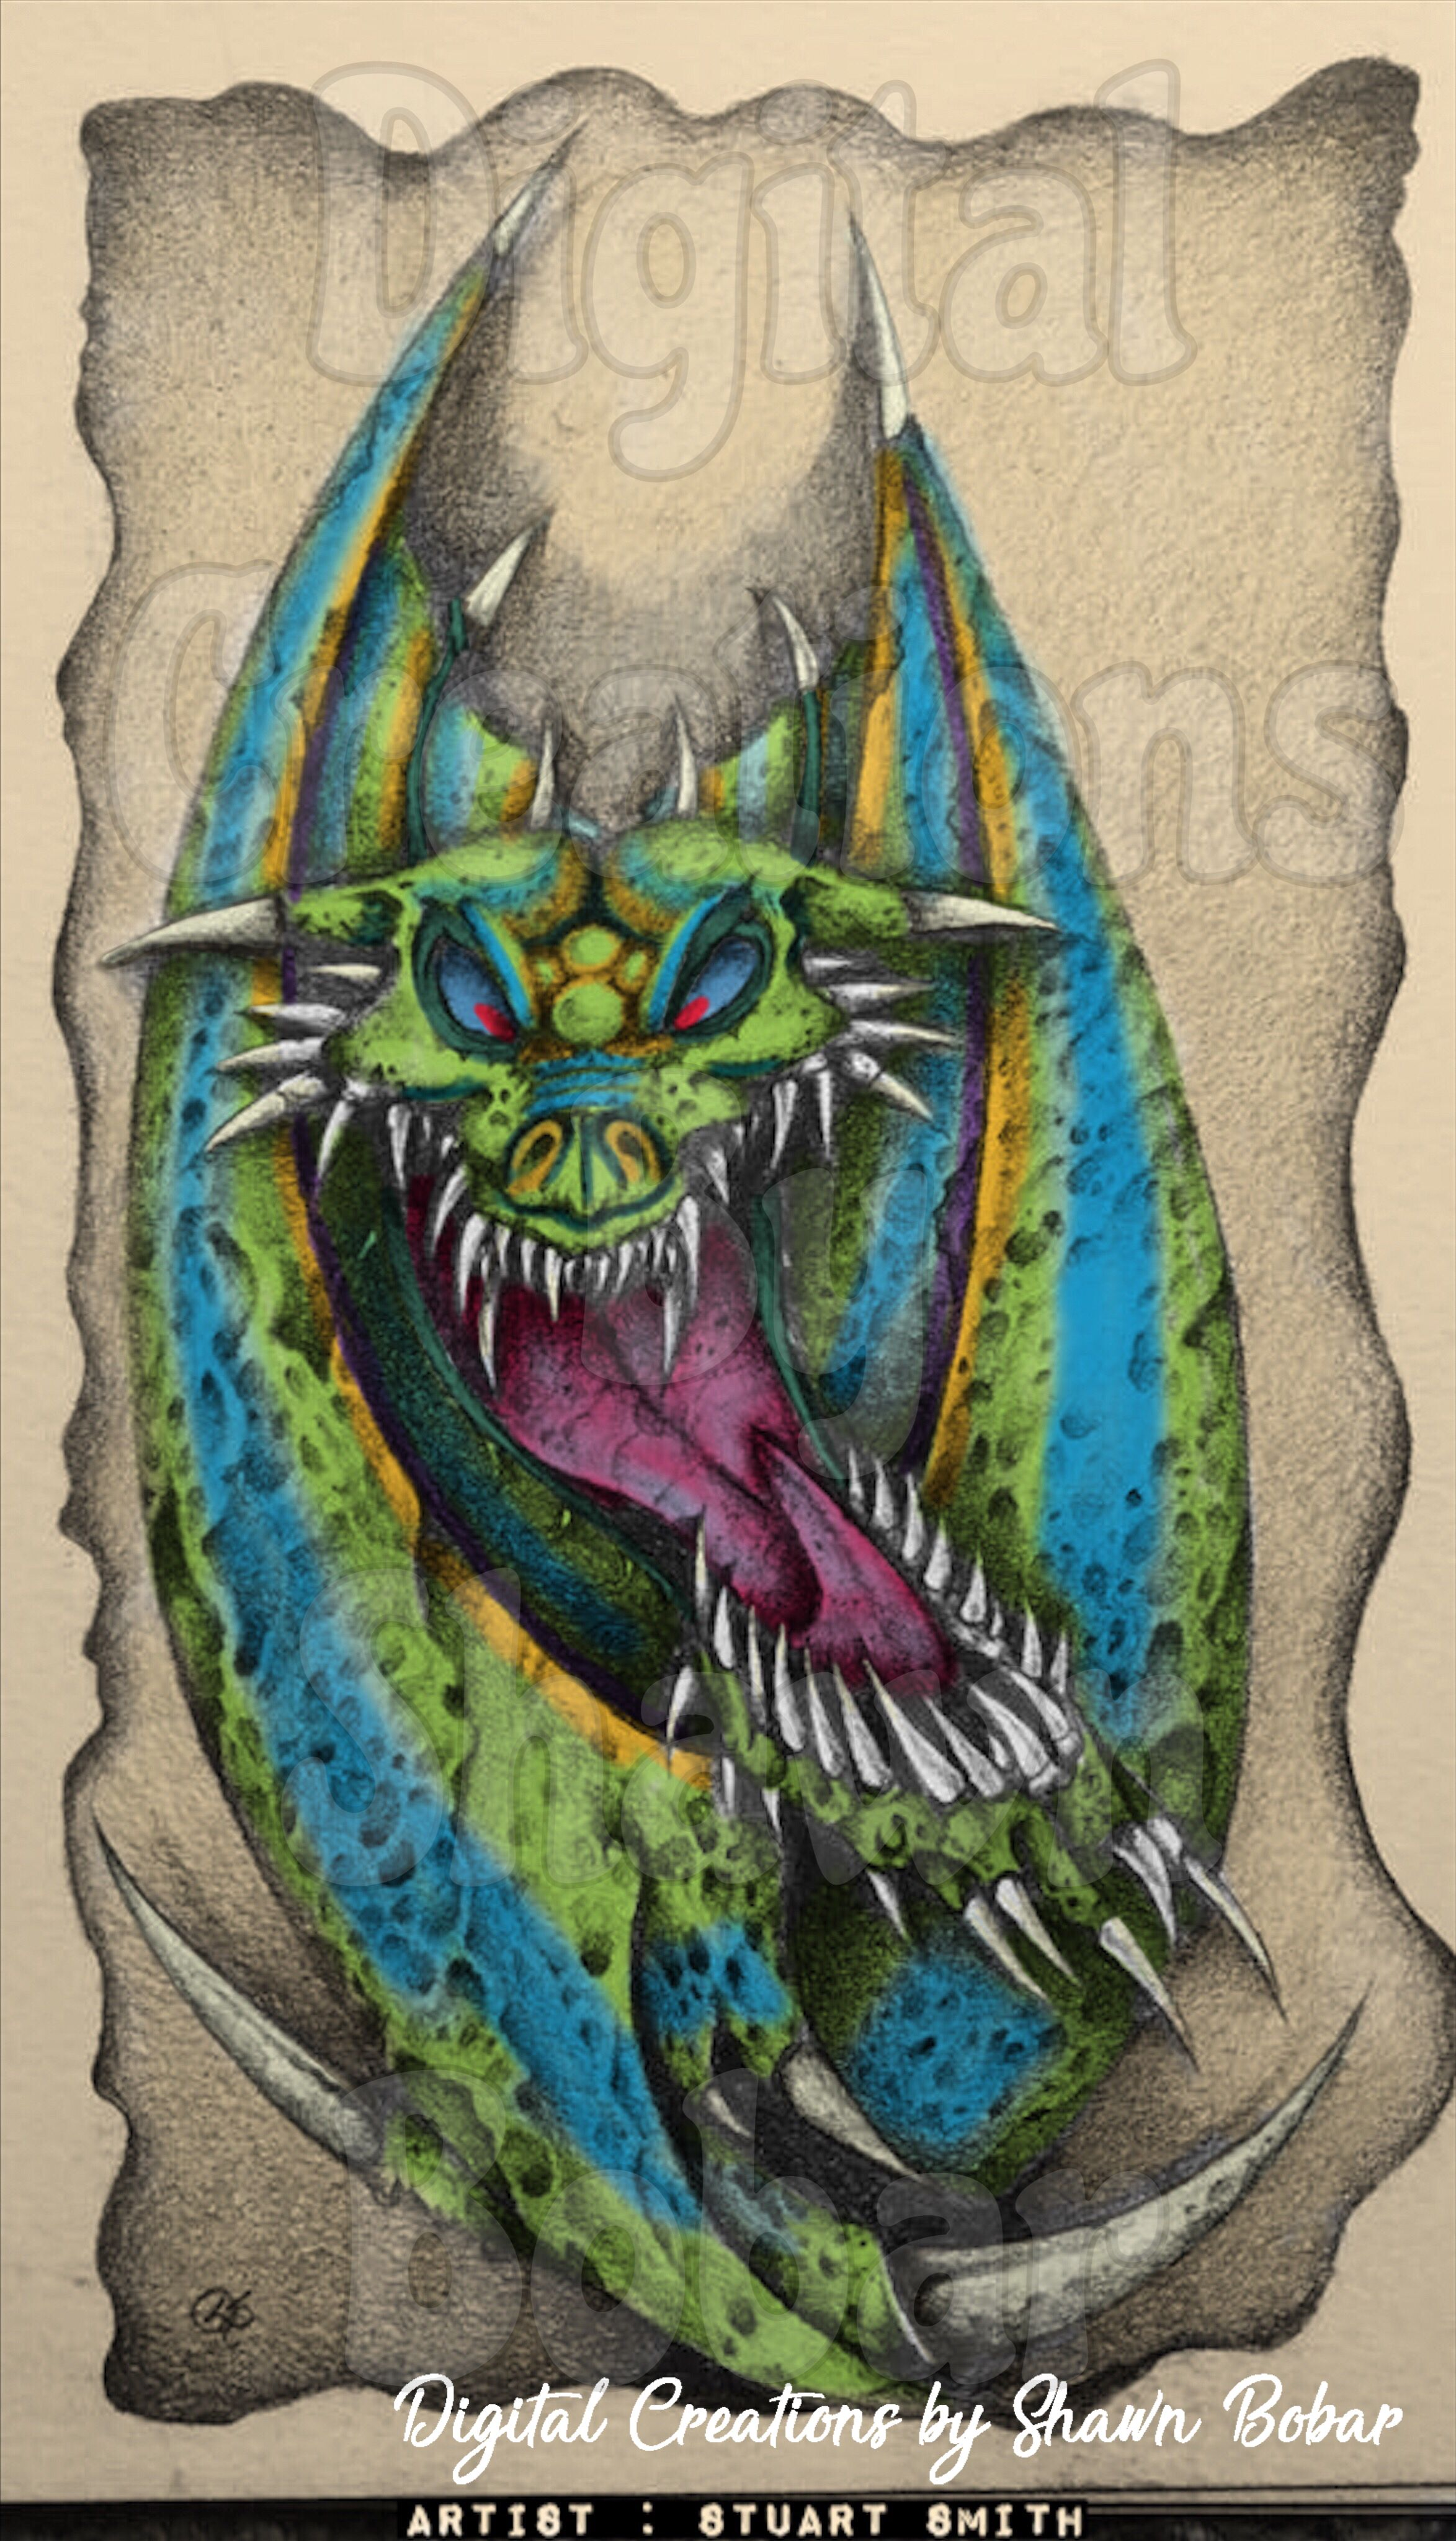 Artist Stuart Smith Digitally Colored Using Pigment IPad Pro Apple Pen